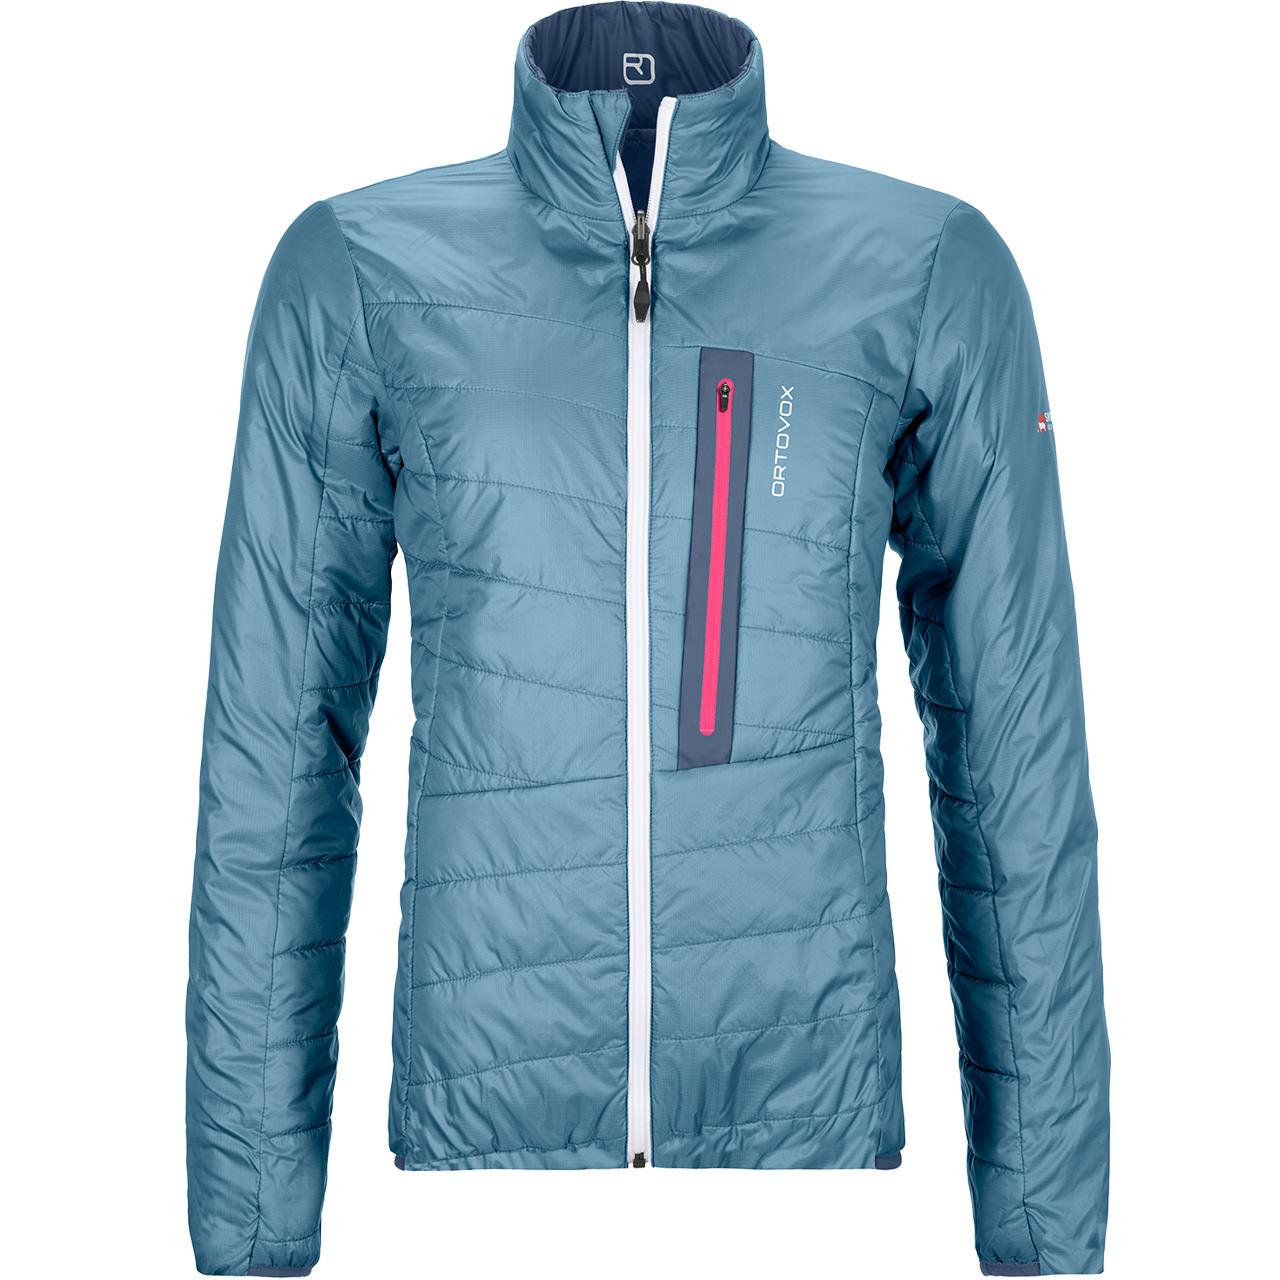 Ortovox Ortovox Piz Bial Jacket Damen Wendejacke